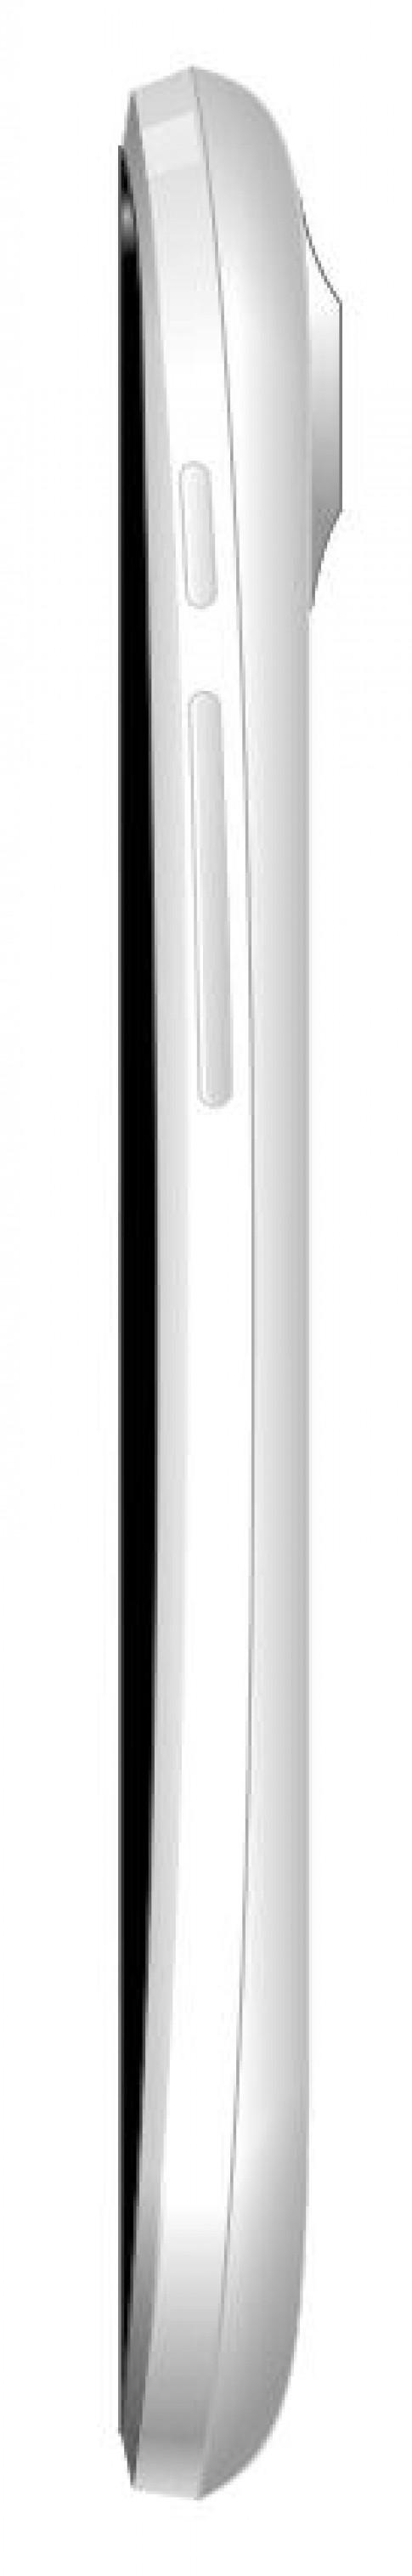 Smartphone chip lõi kép của VinaPhone